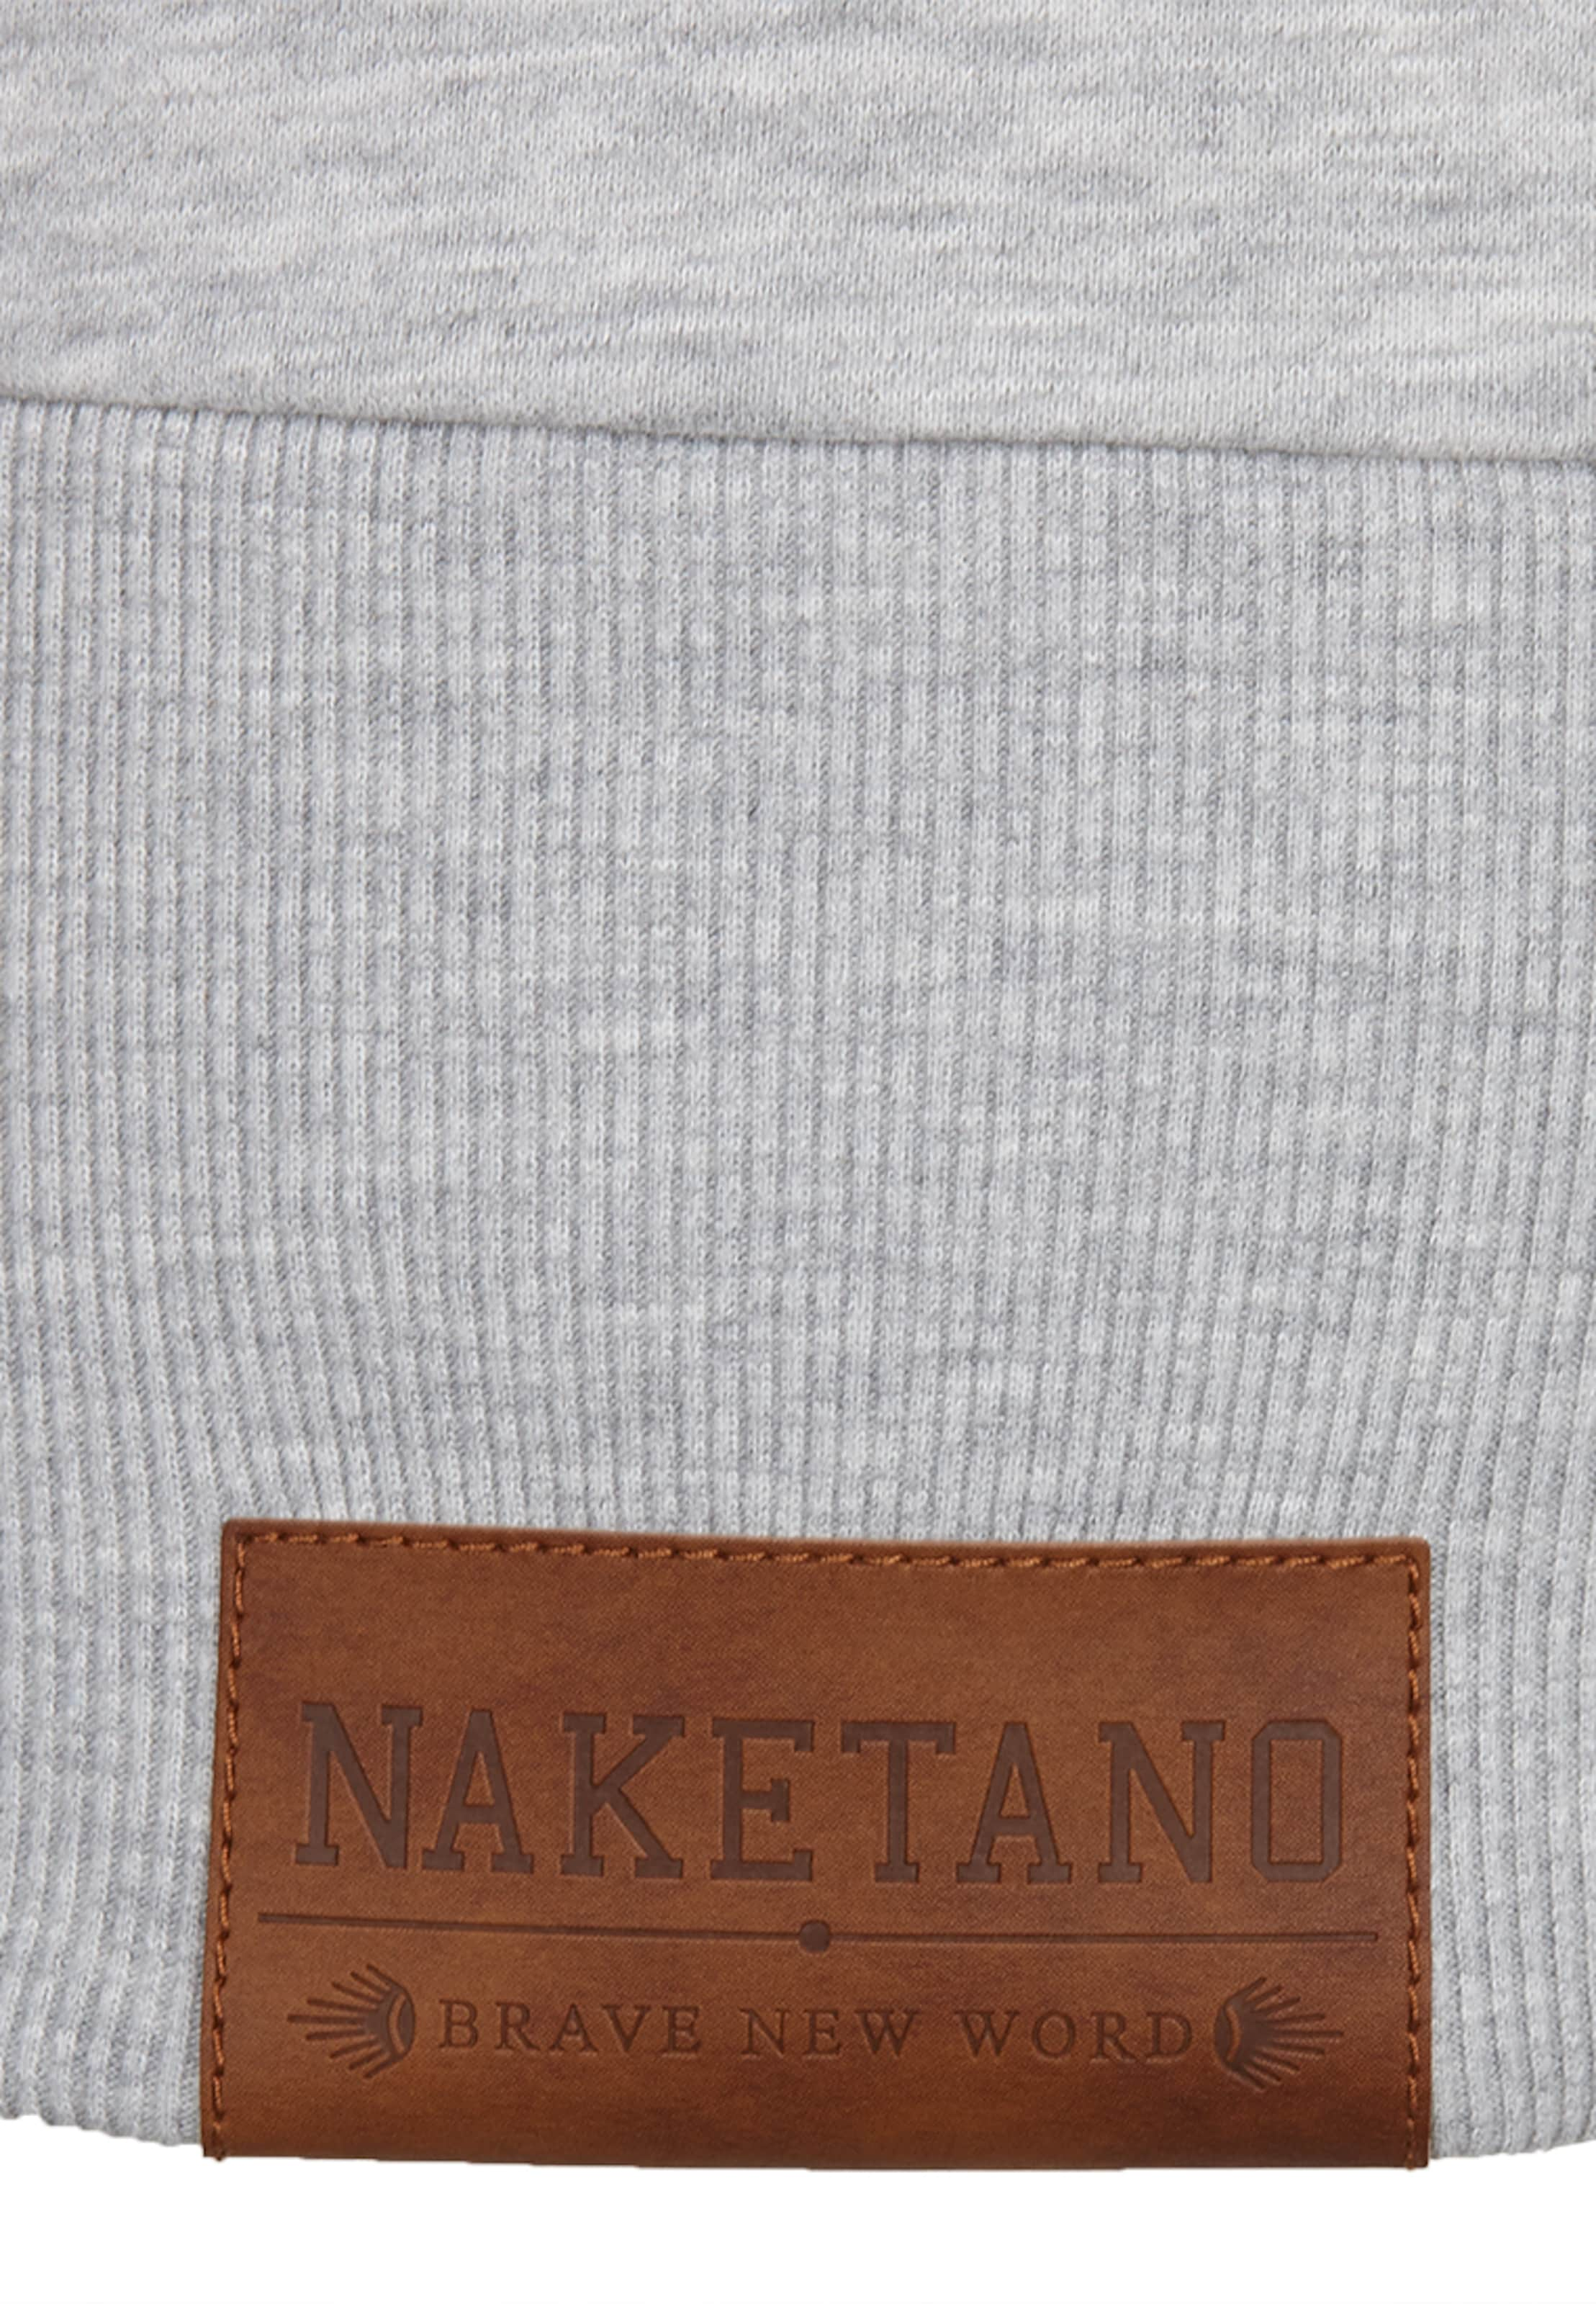 En Menthe 'madame Sweat Naketano Unschuld Bangs' shirt OpalGris LVjqpSUzMG